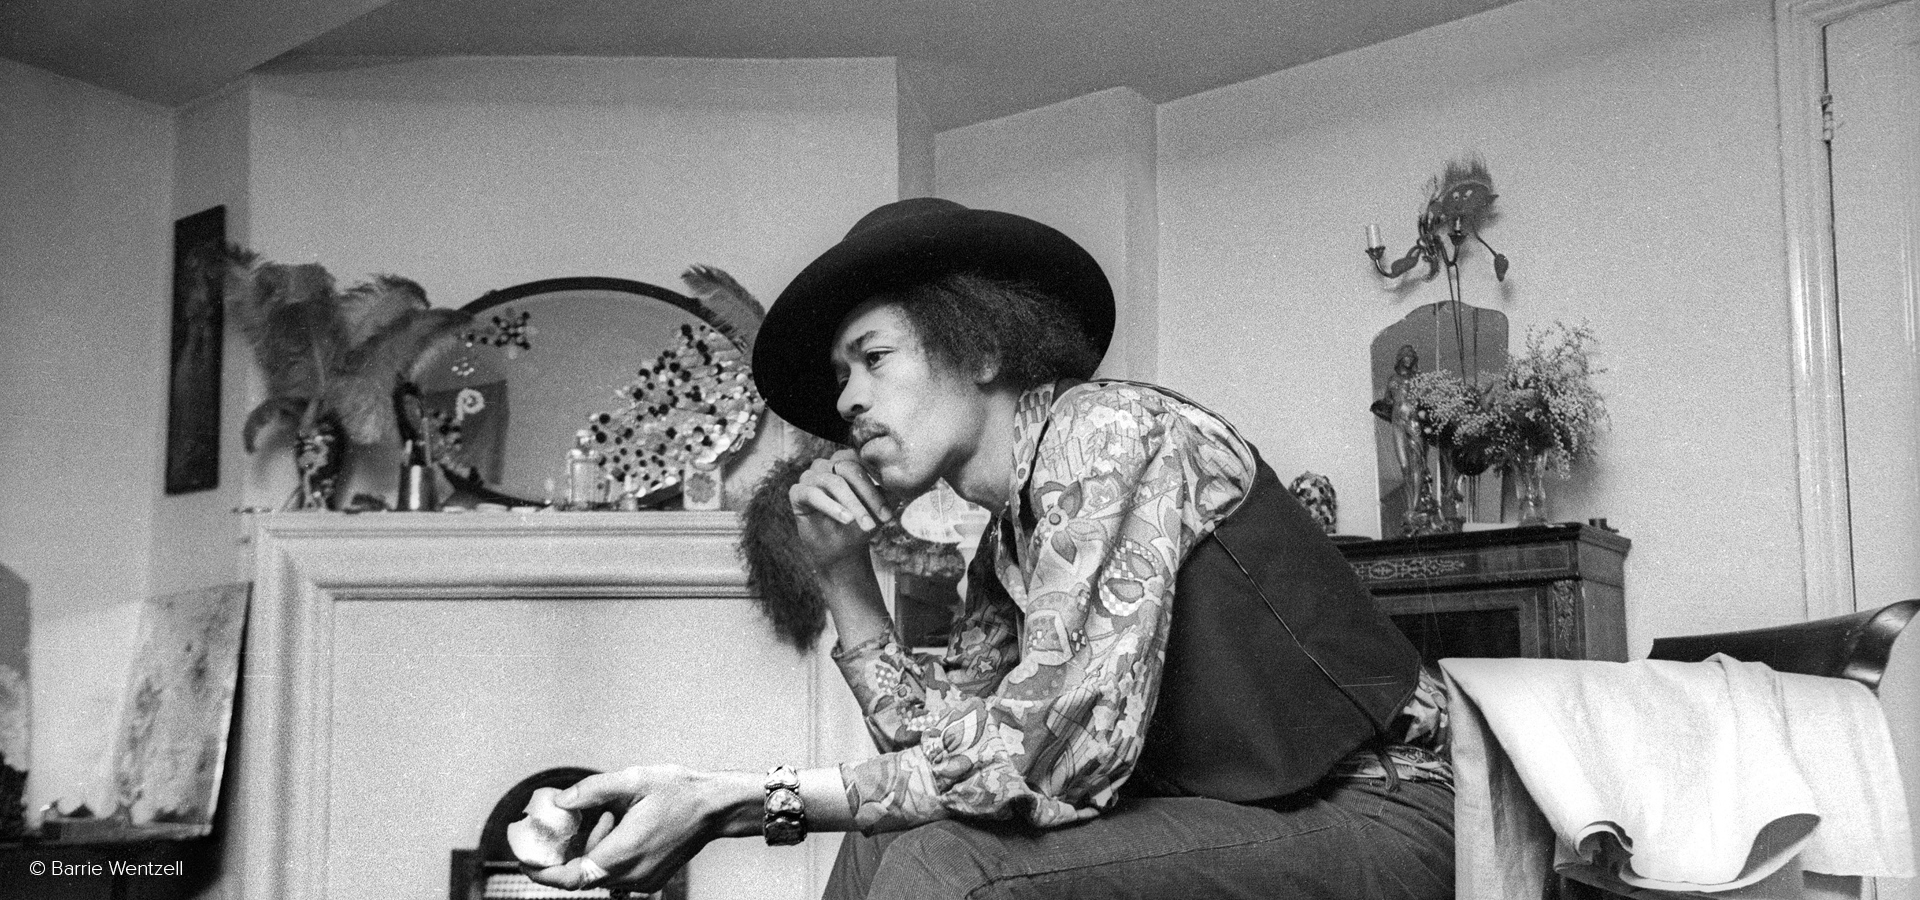 Jimi Hendrix: the Sgt Pepper experience